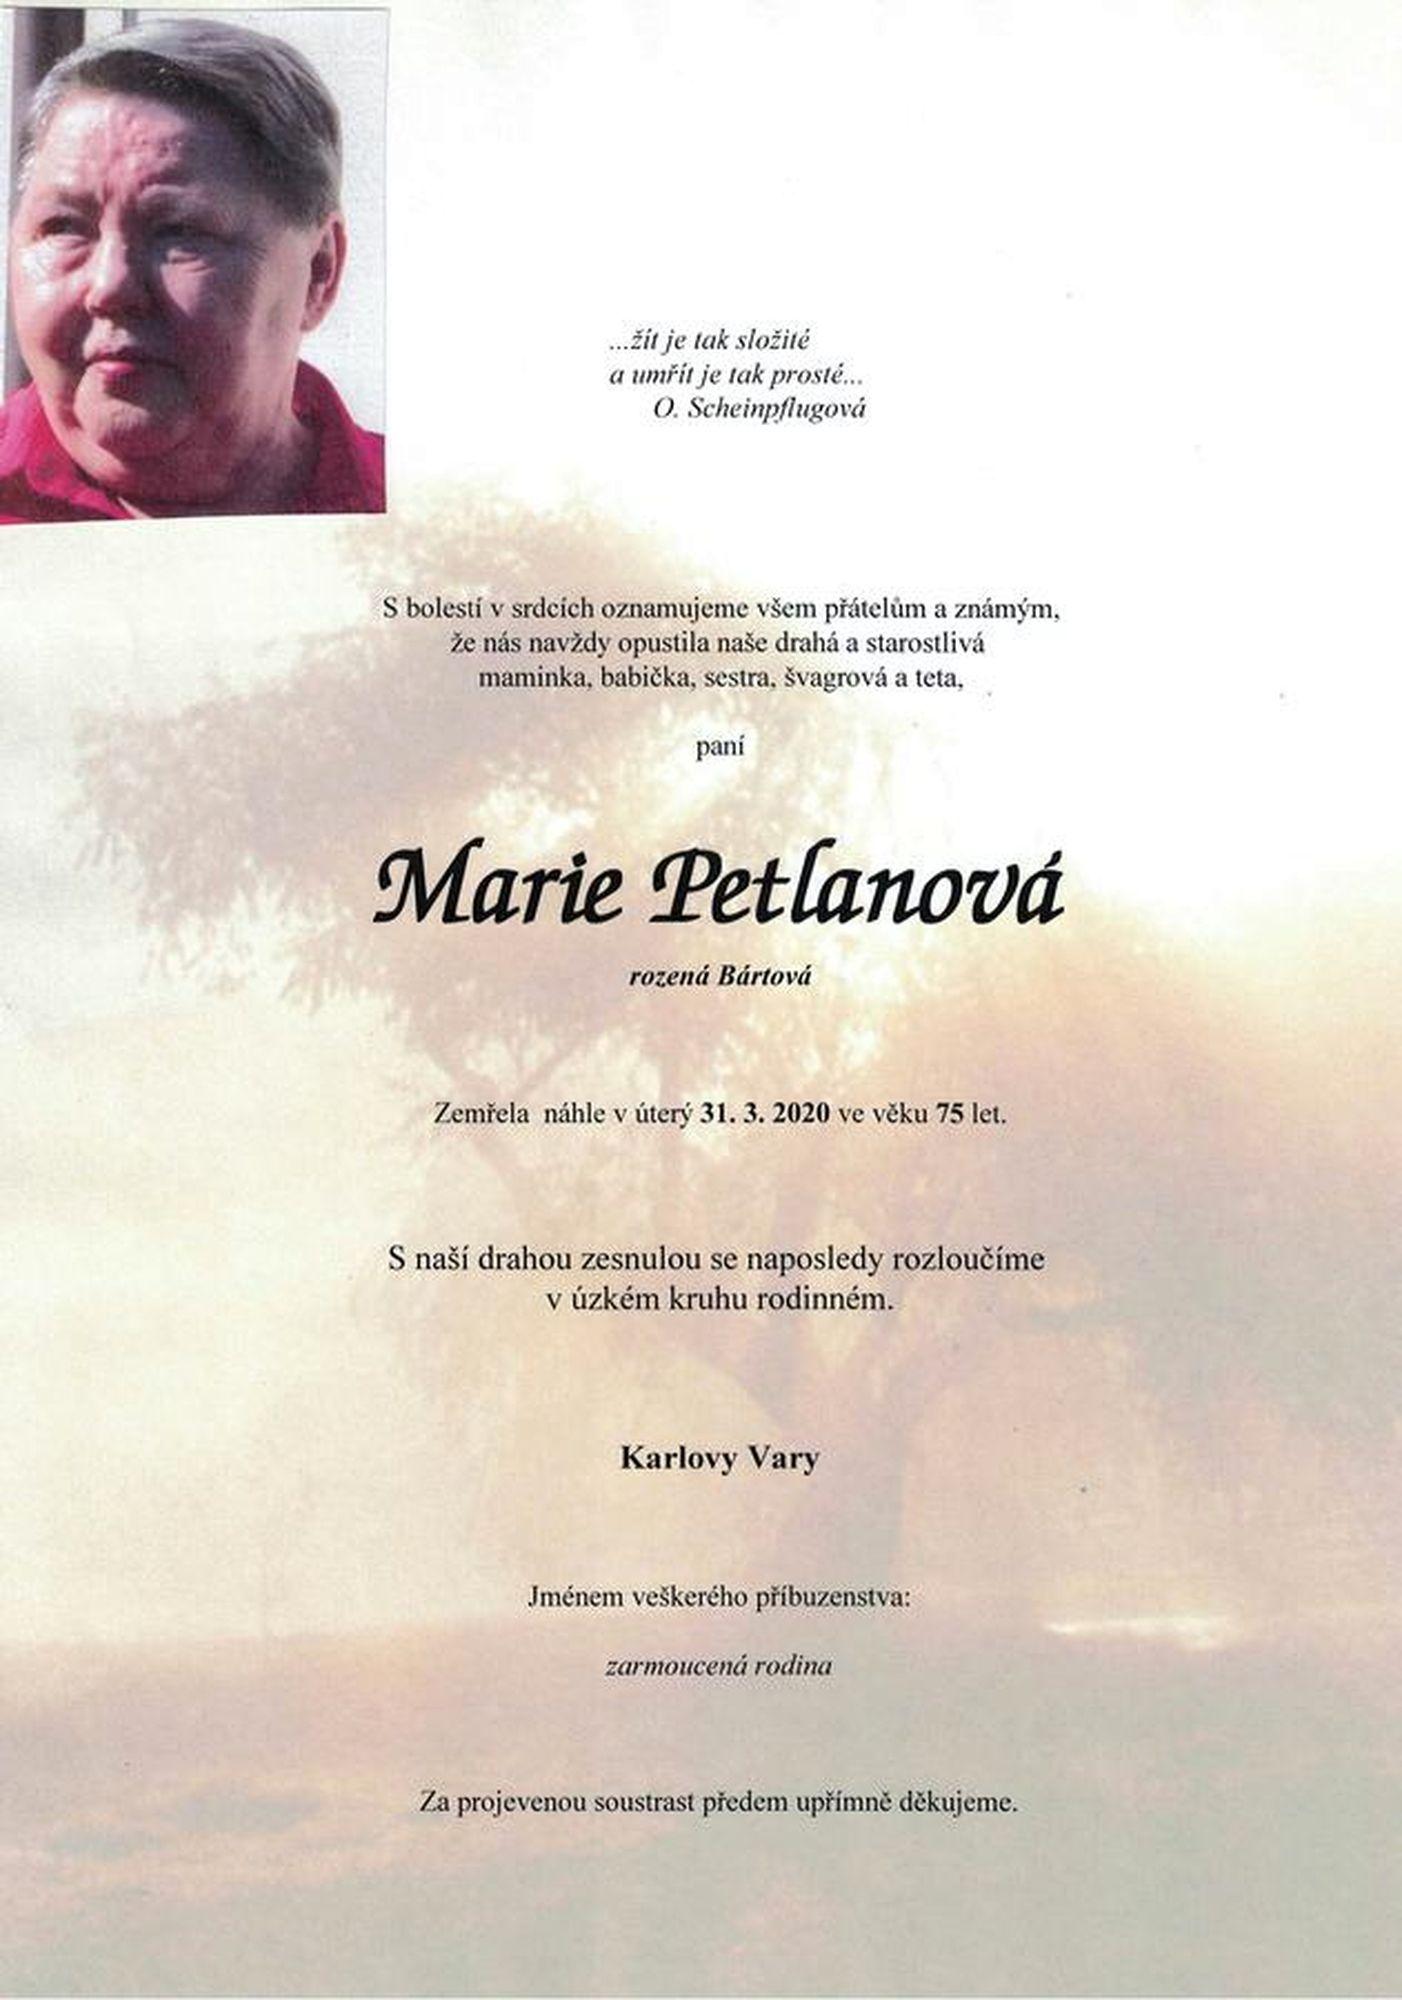 Marie Petlanová